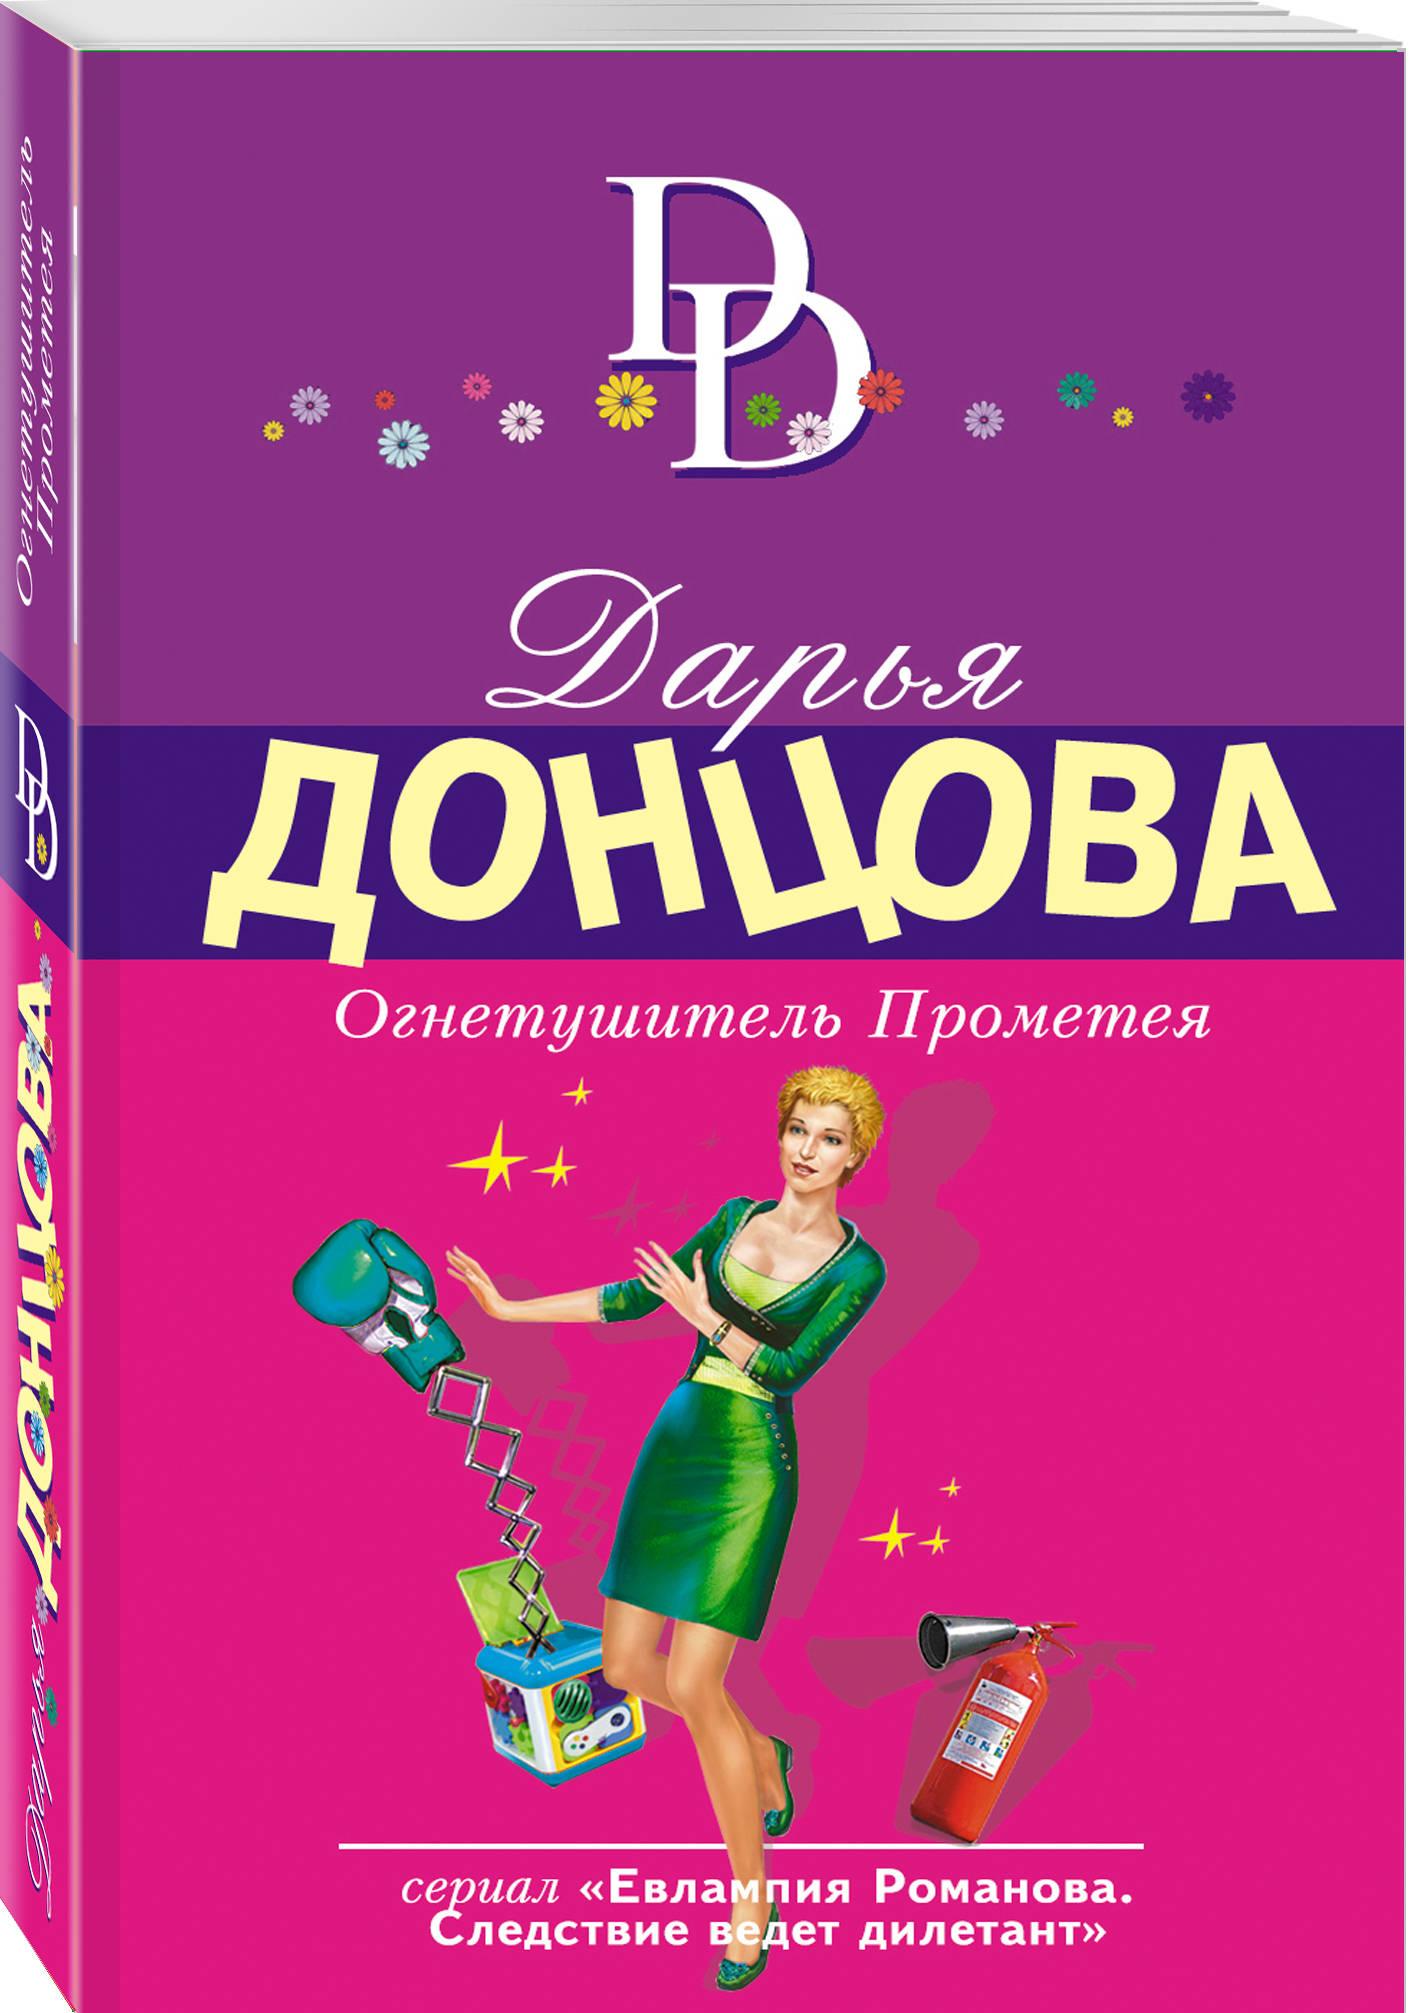 Донцова Дарья Аркадьевна Огнетушитель Прометея